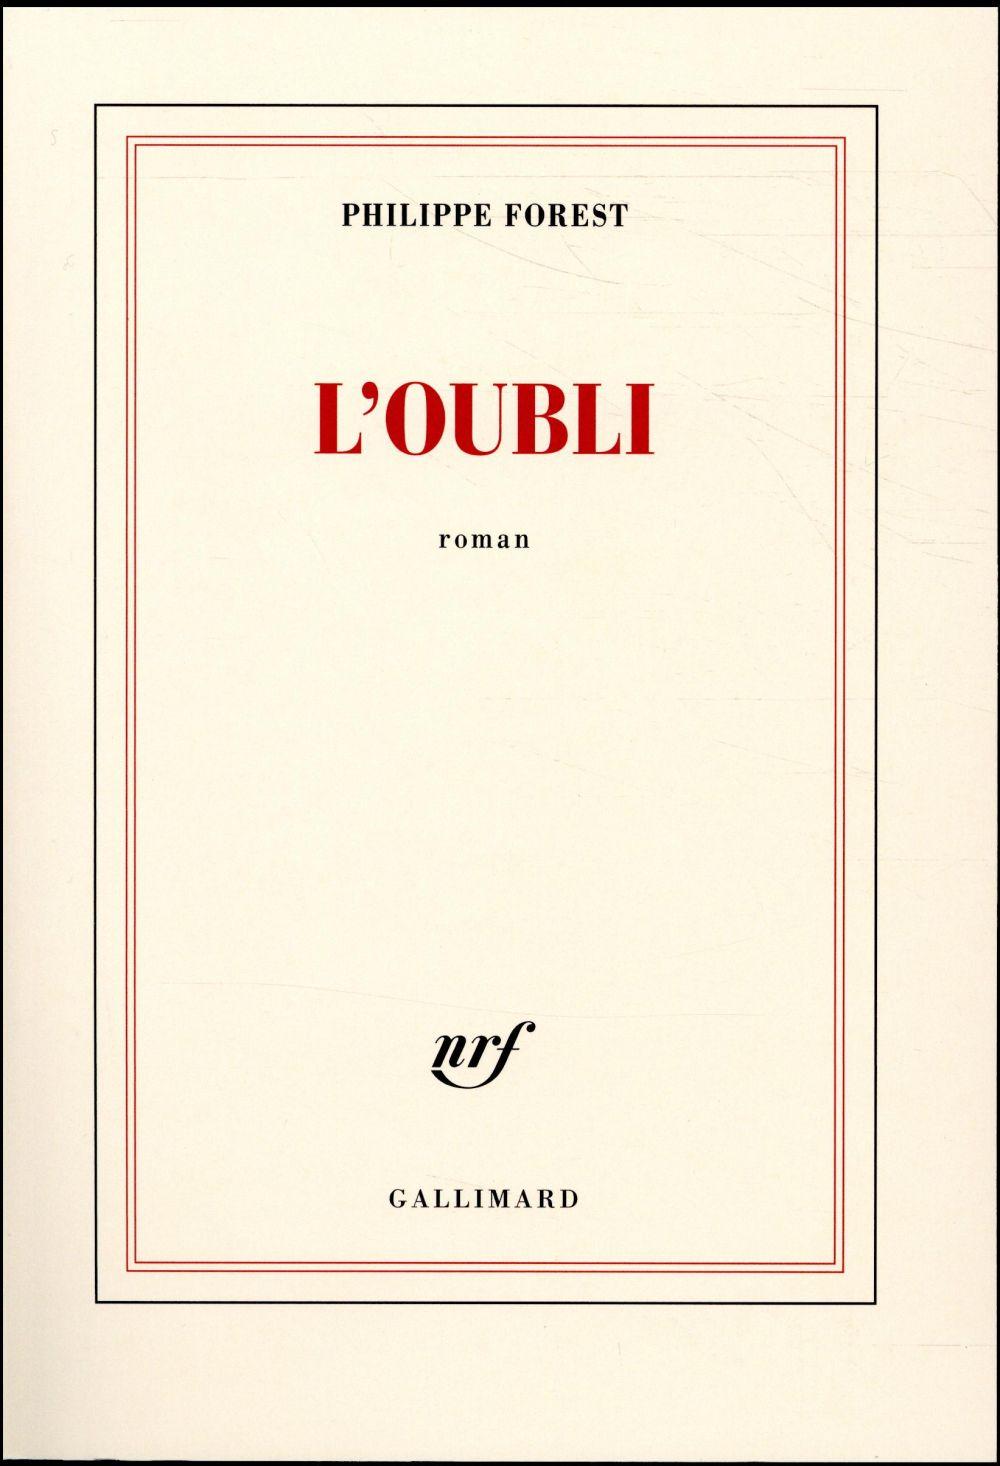 L'OUBLI